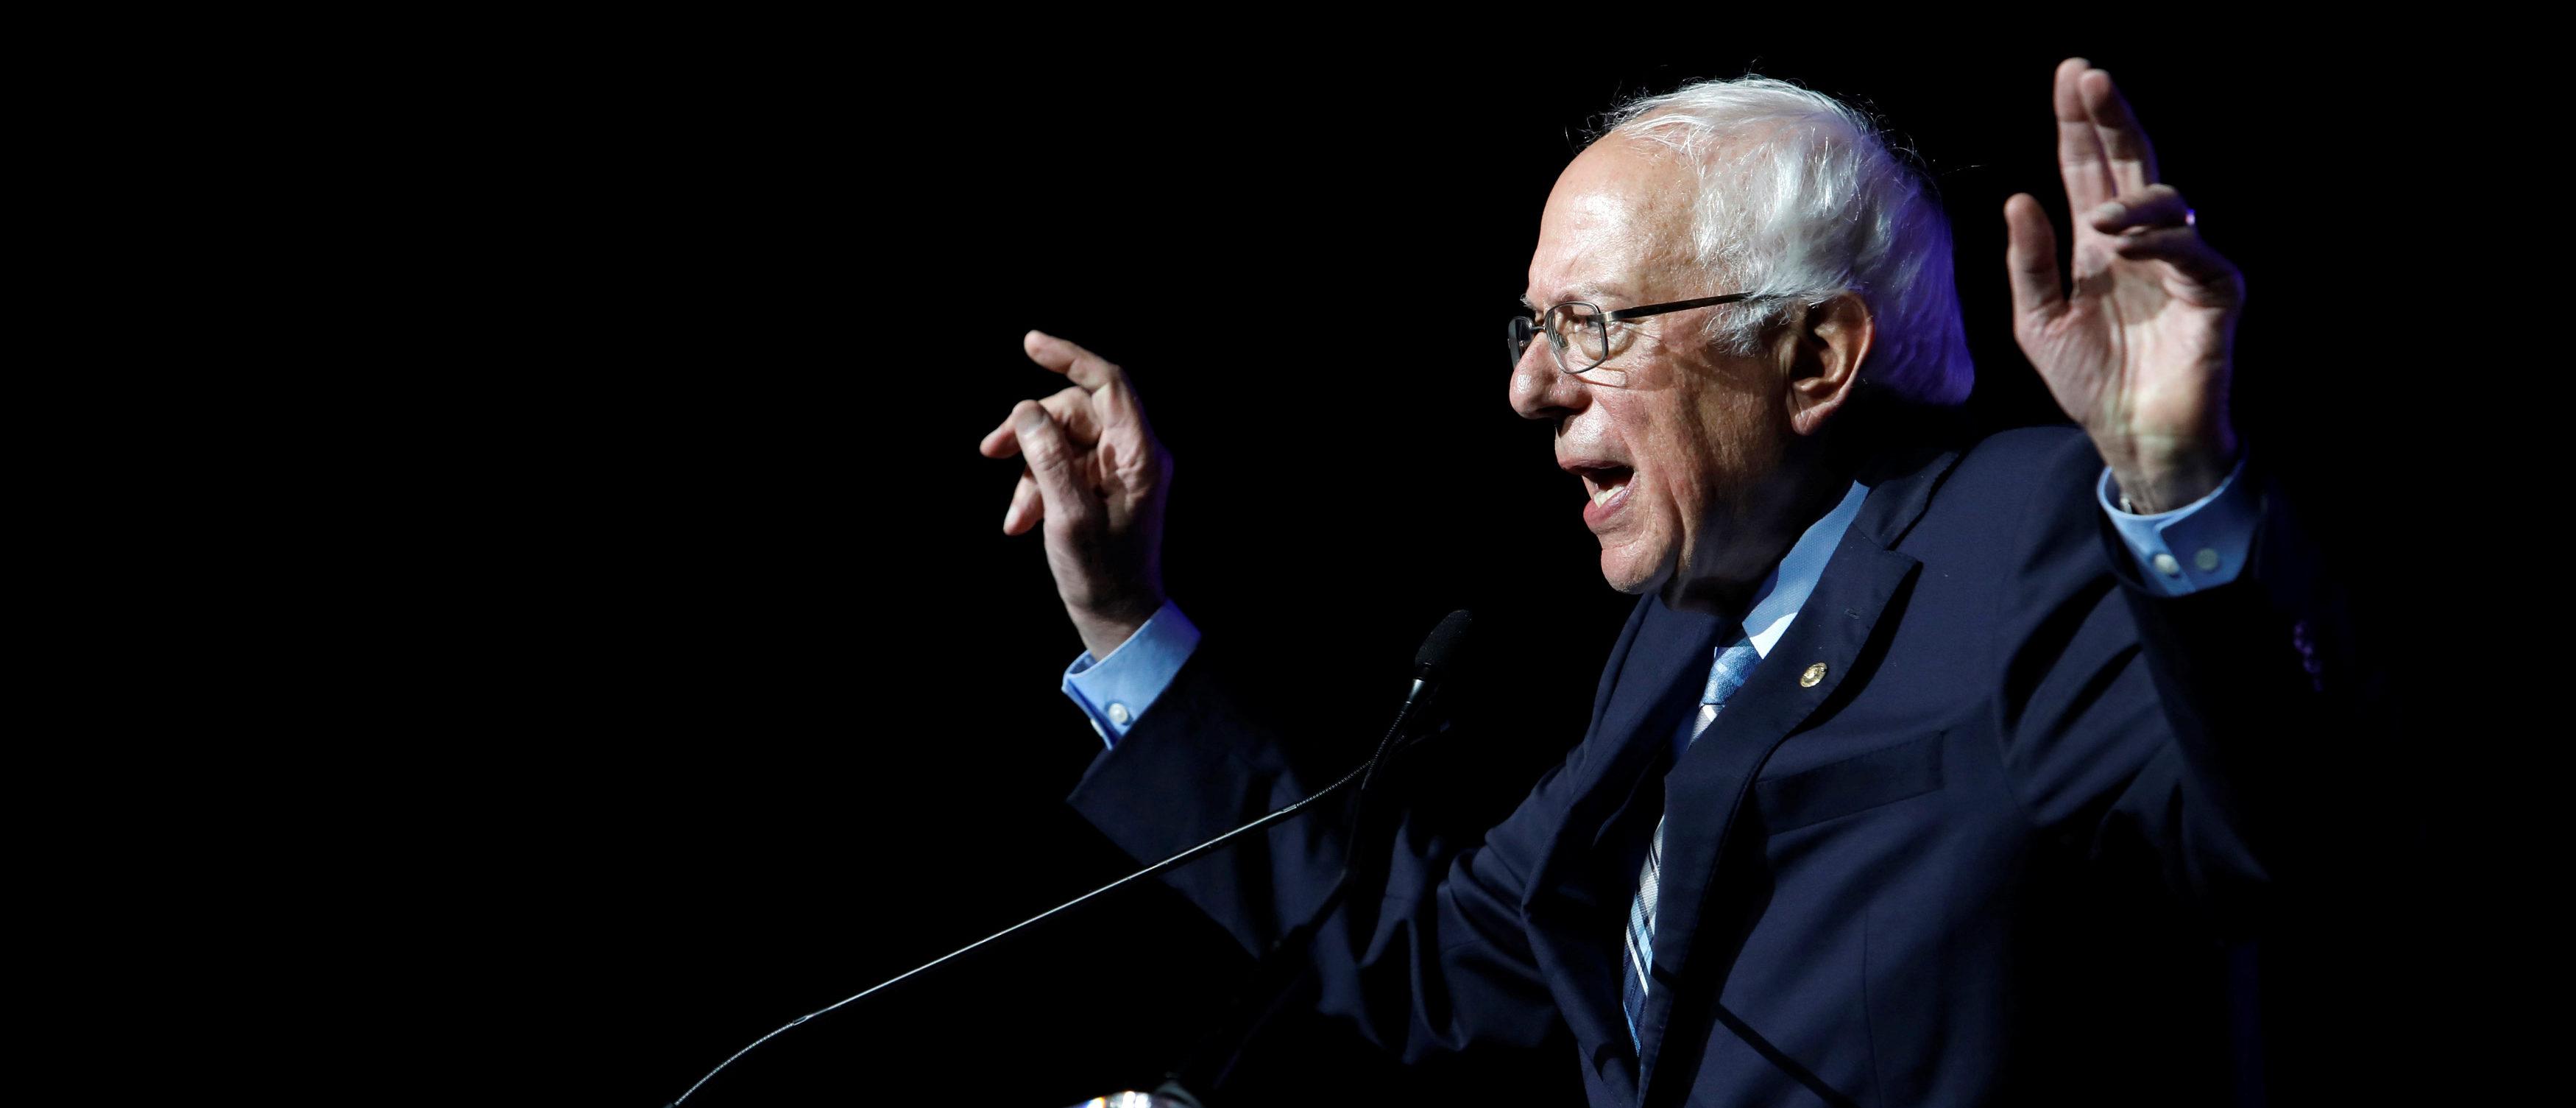 Bernie Sanders Calls For Complete Ban On Deportations